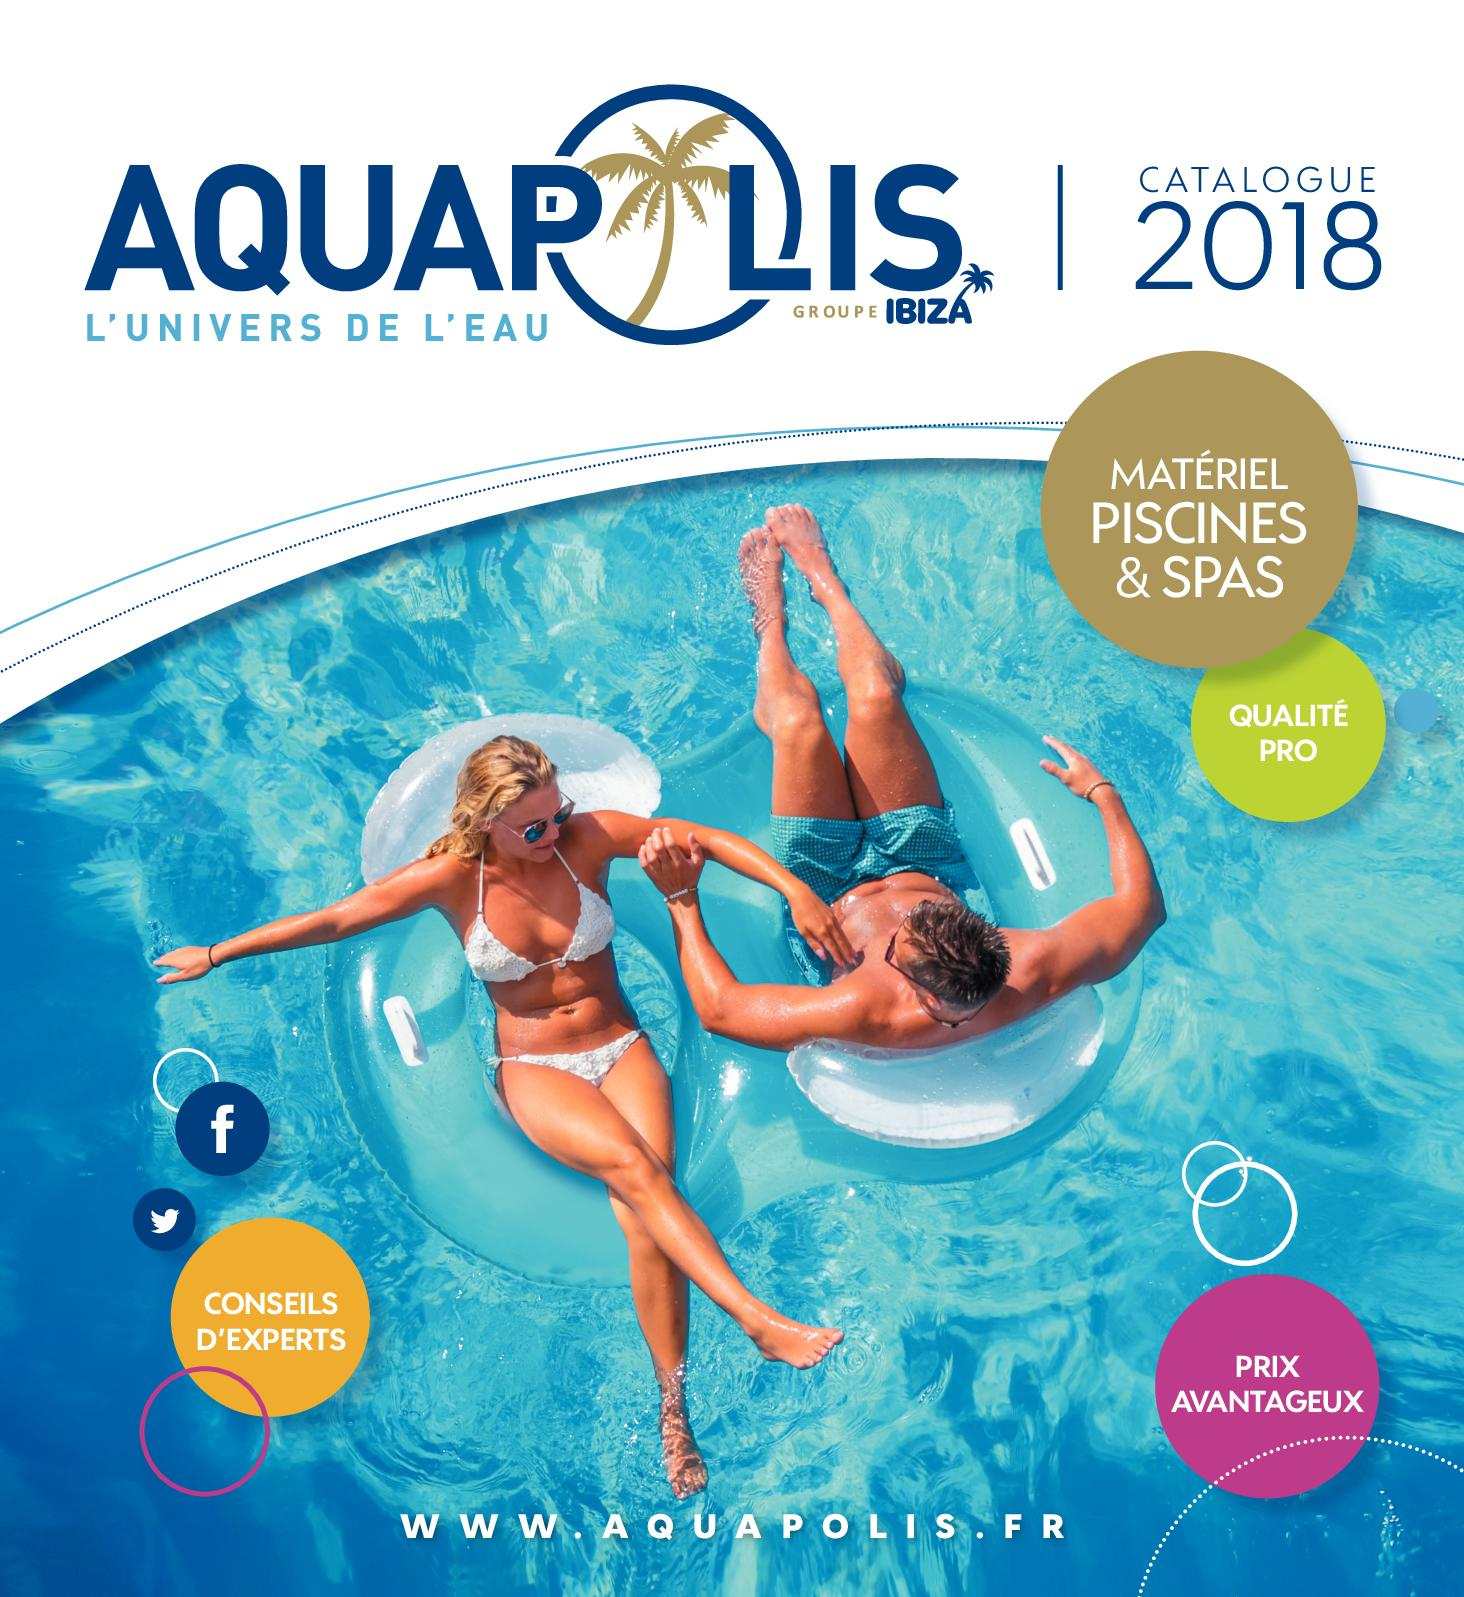 Calaméo - Aquapolis Catalogue 2018 pour Piscine Gonflable Castorama